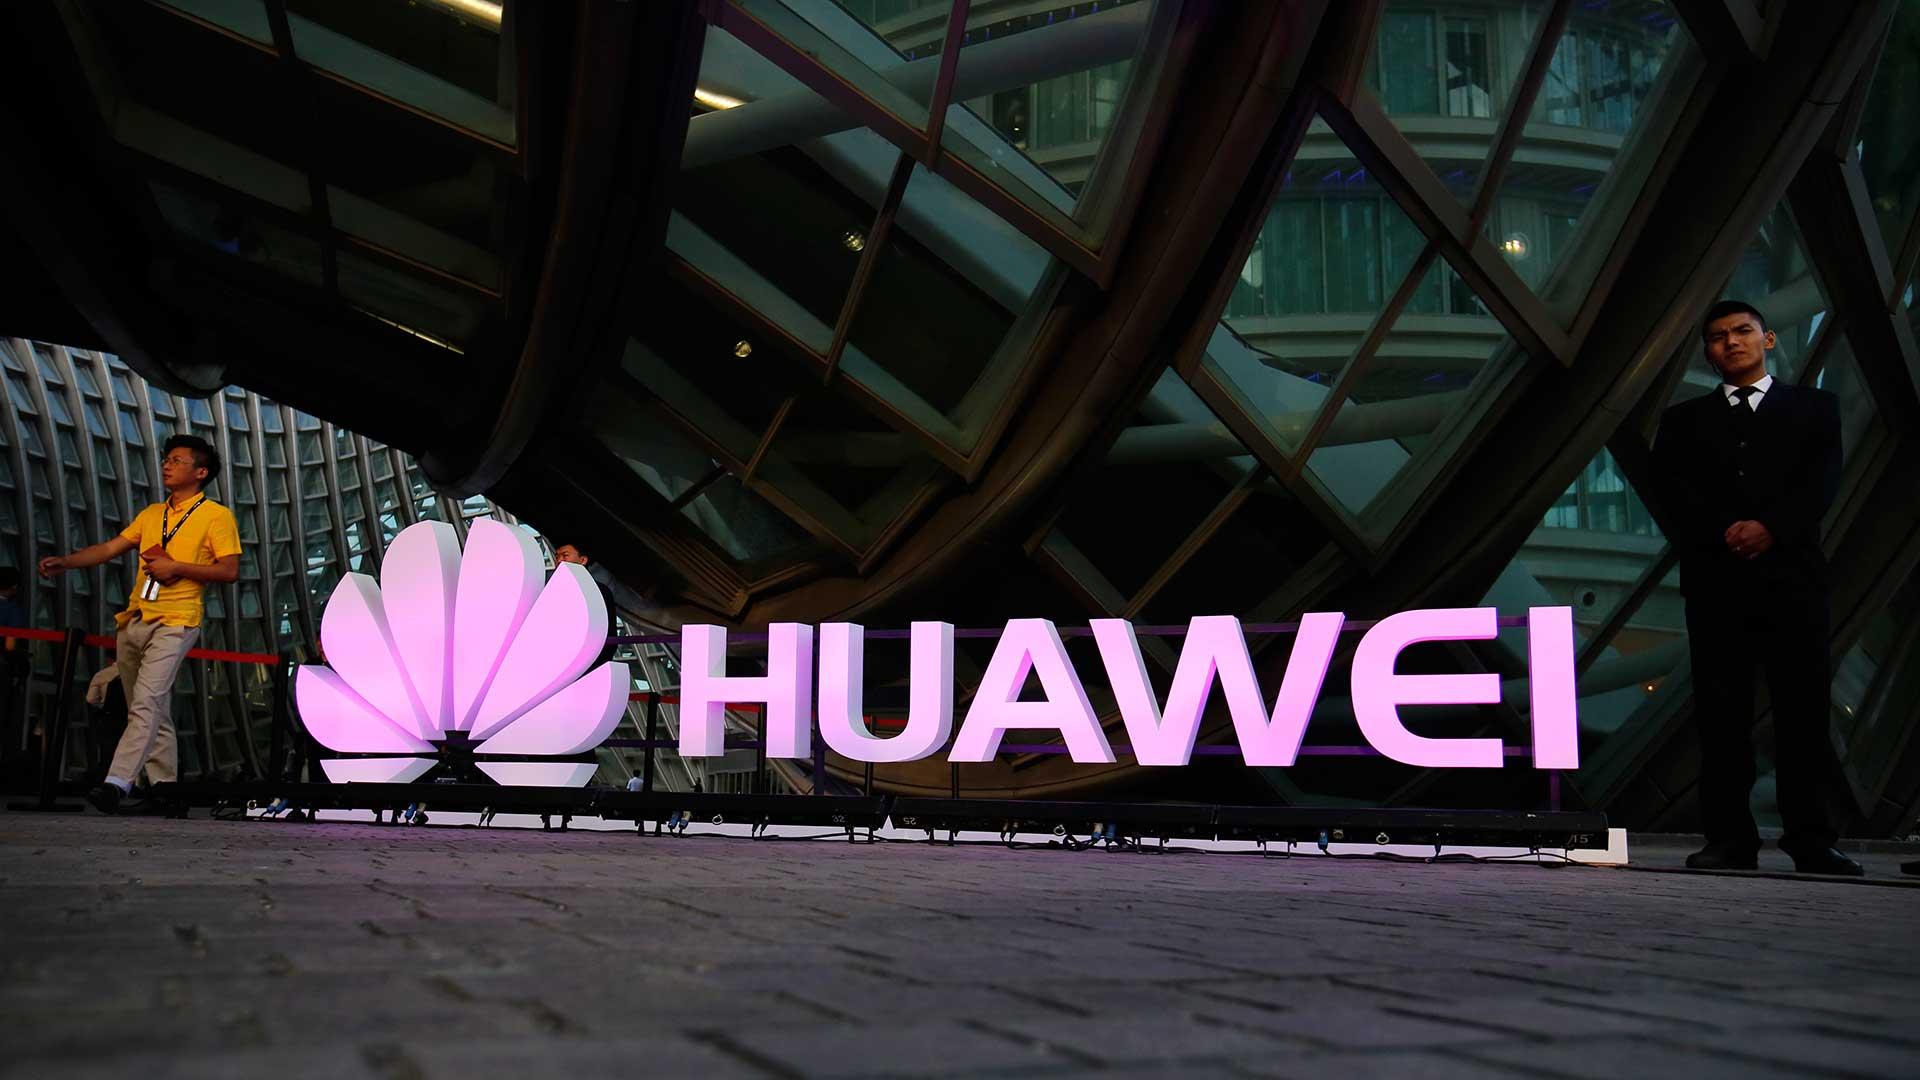 Huawei lanzará una plataforma  similar a Netflix 1